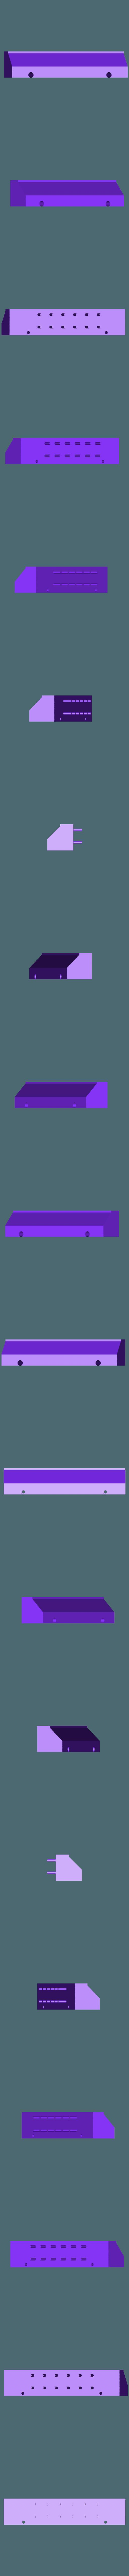 drill_holder_v1_19_mm_pegboard_version.stl Download free STL file Pegboard Drill Bit holder 19 mm • 3D printer object, simonlewis962